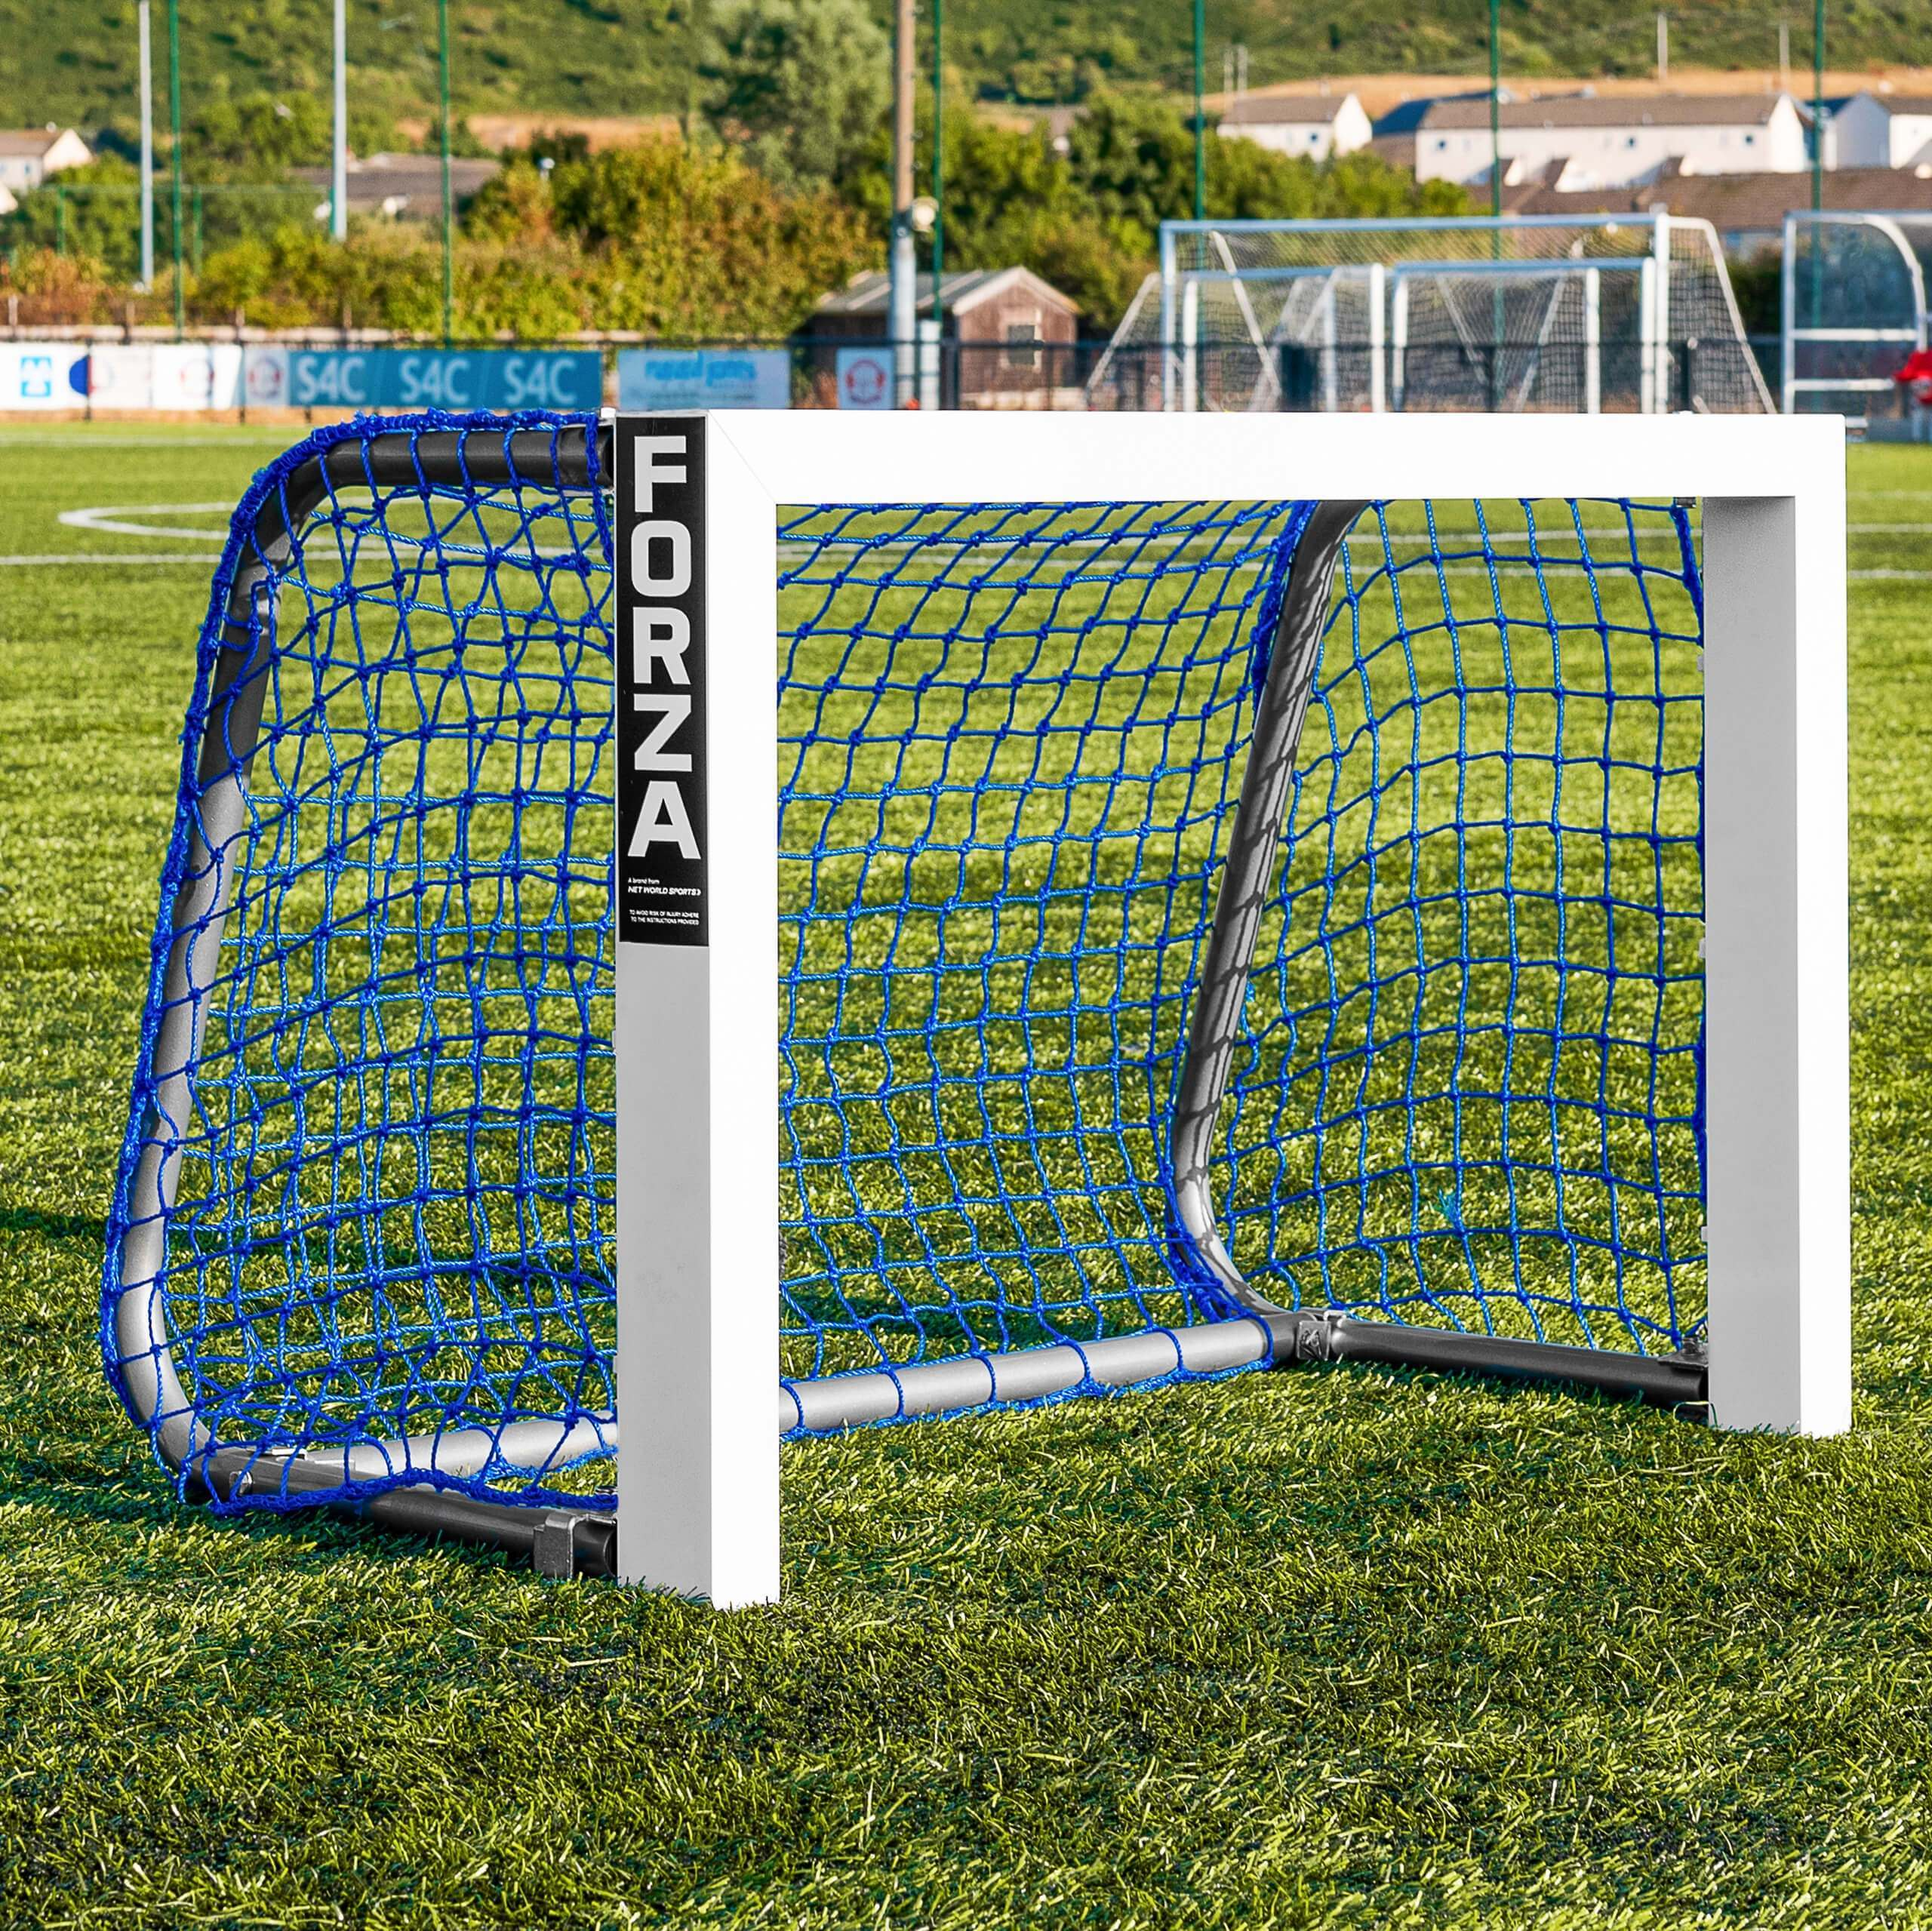 FORZA Alu Mini Target Football Goal - Blue Net